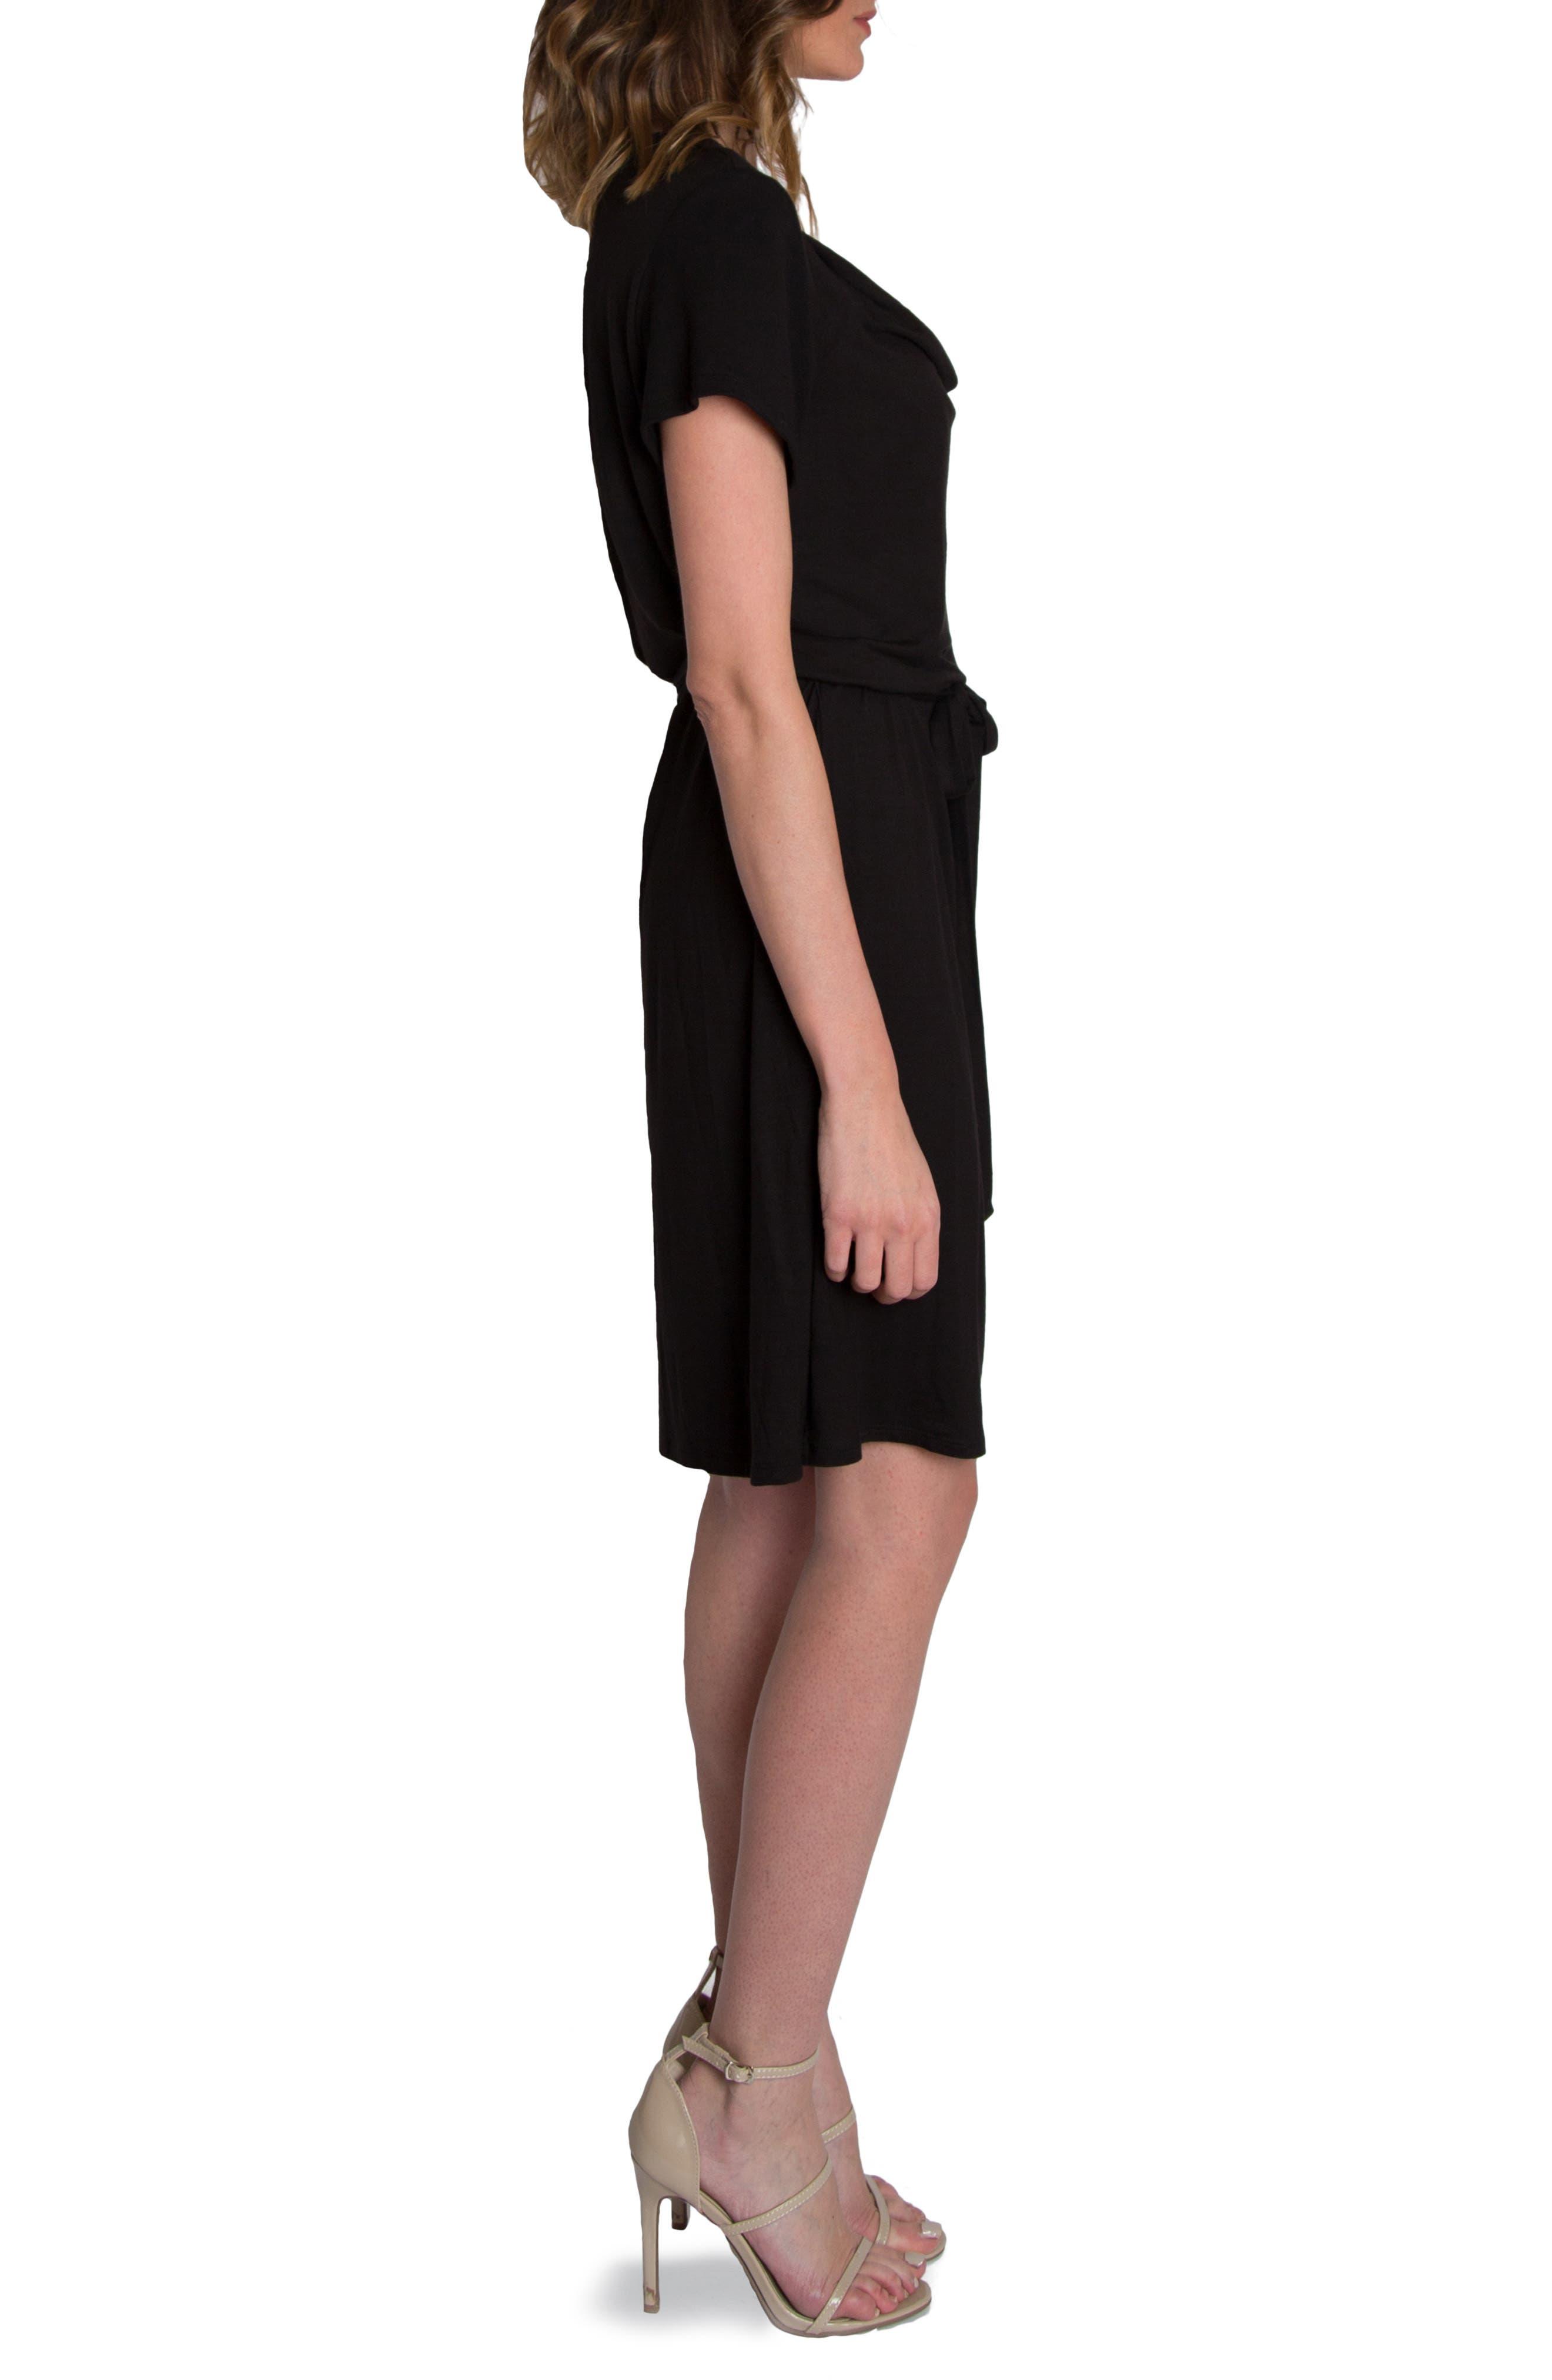 'Chic' Cowl Neck Nursing Dress,                             Alternate thumbnail 4, color,                             BLACK